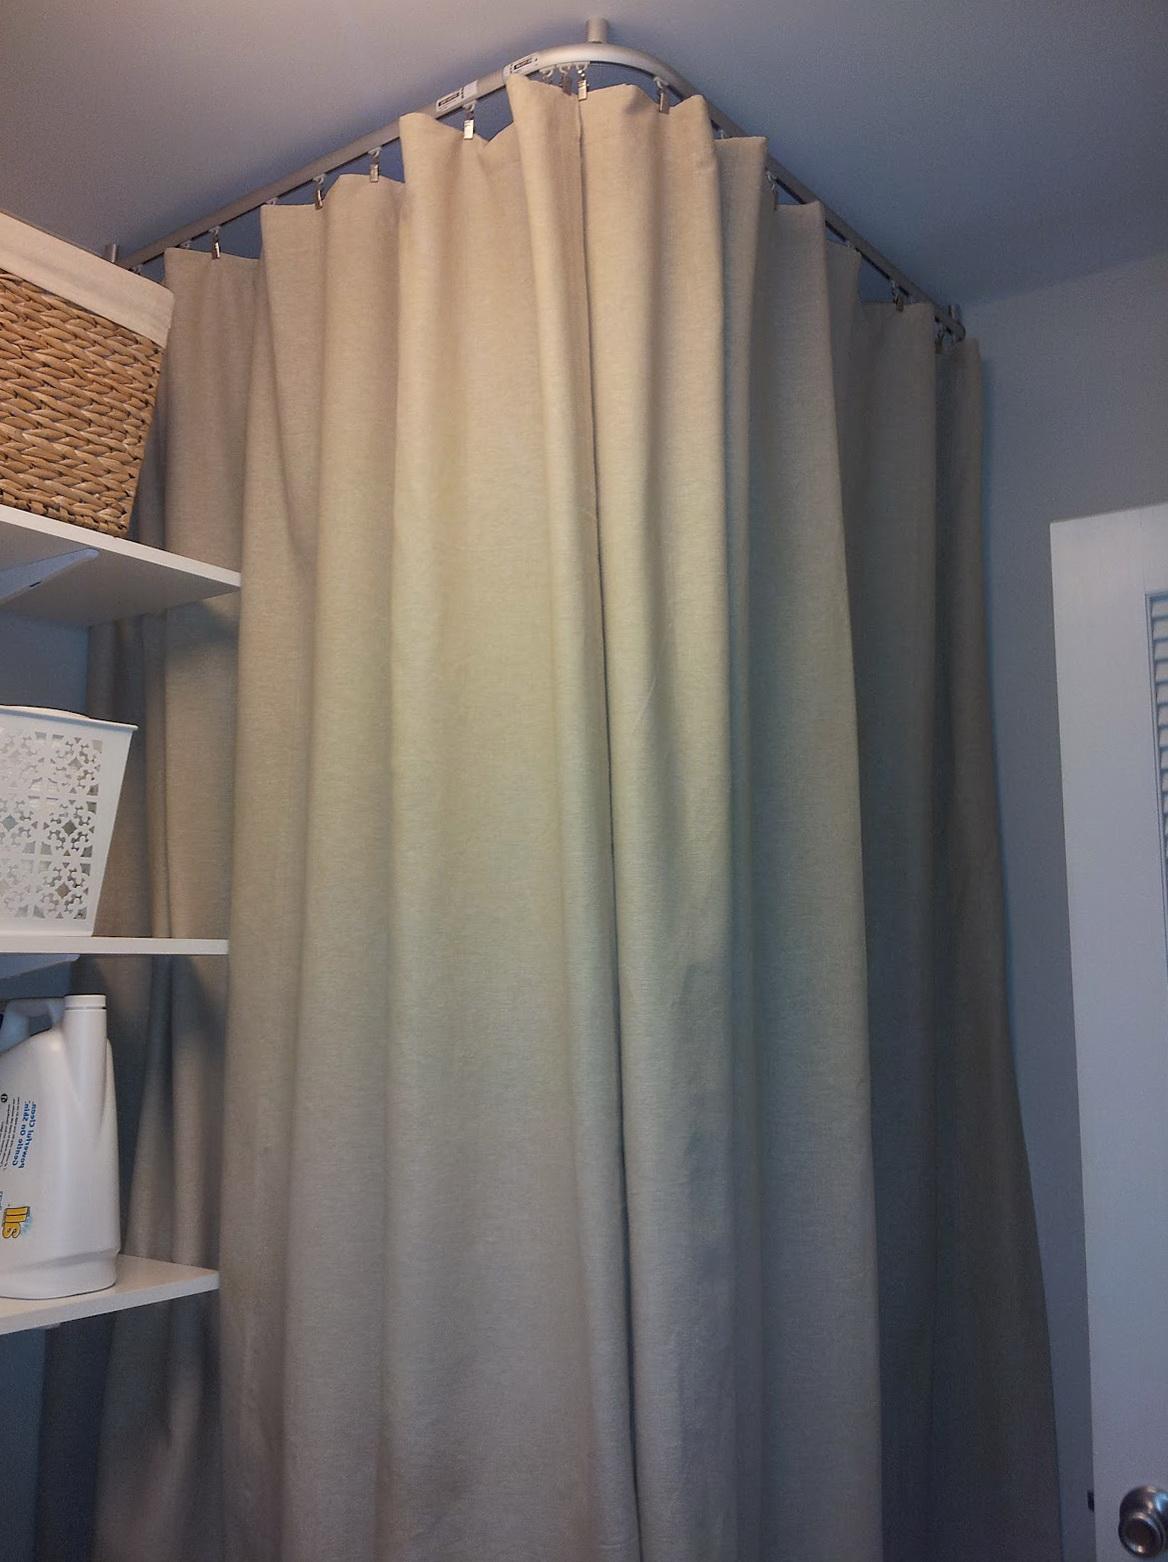 Ceiling Mount Curtain Track Ikea Home Design Ideas